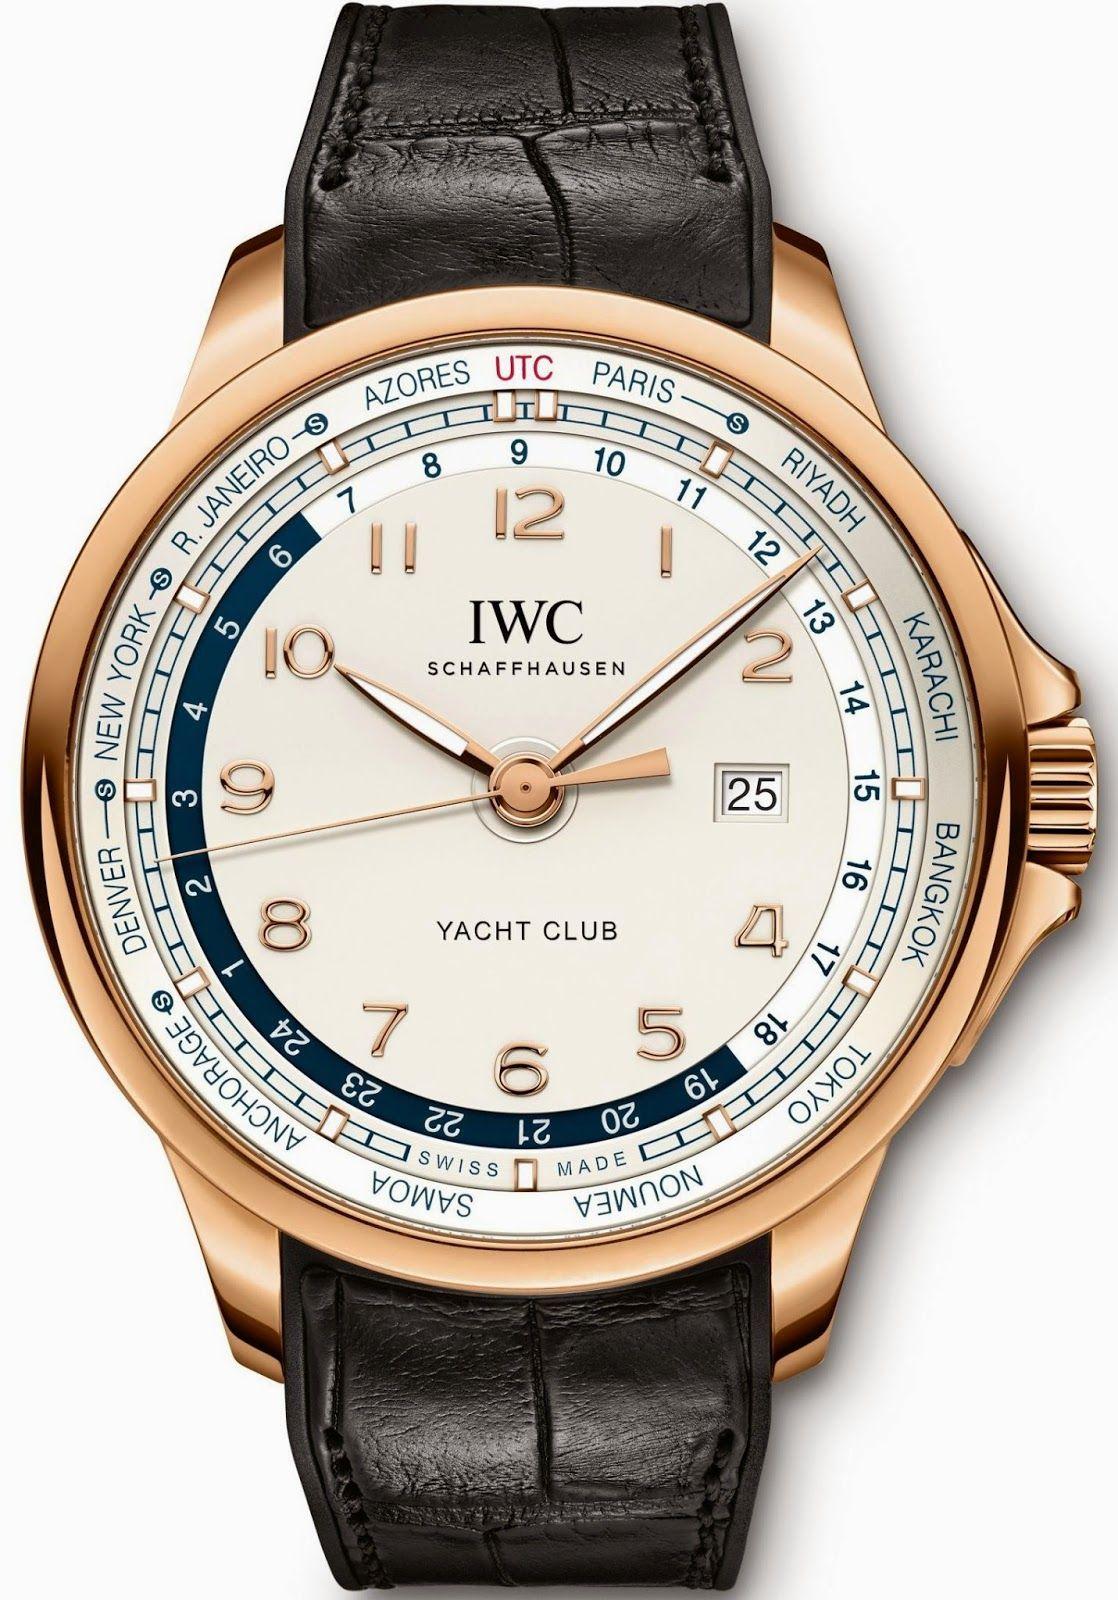 IWC Schaffhausen Portugieser Yacht Club Worldtimer Iwc